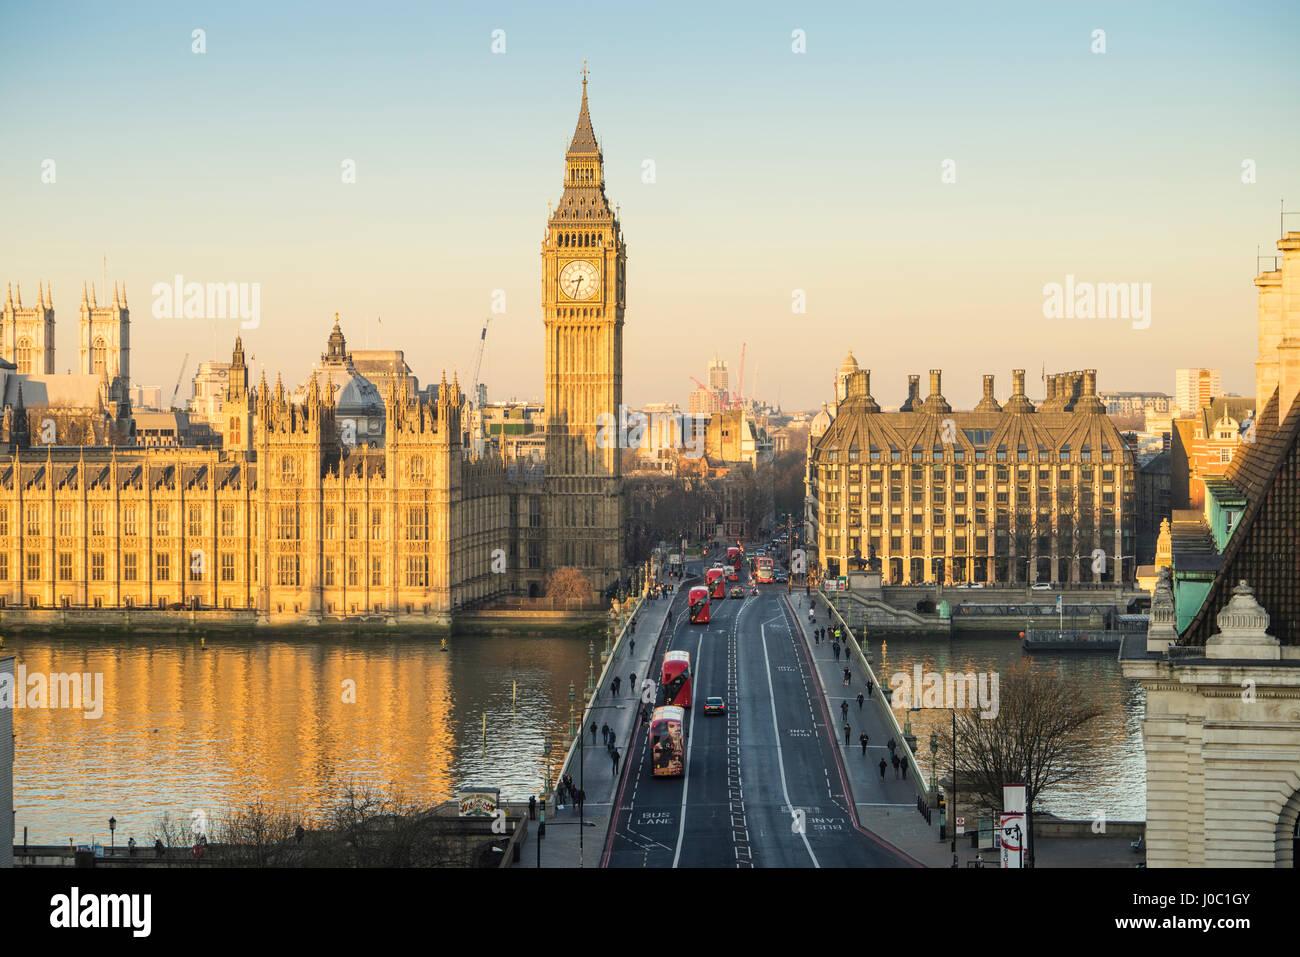 Vogelperspektive Blick auf Big Ben, die Westminster-Palast, UNESCO-Weltkulturerbe und Westminster Bridge, London, Stockbild